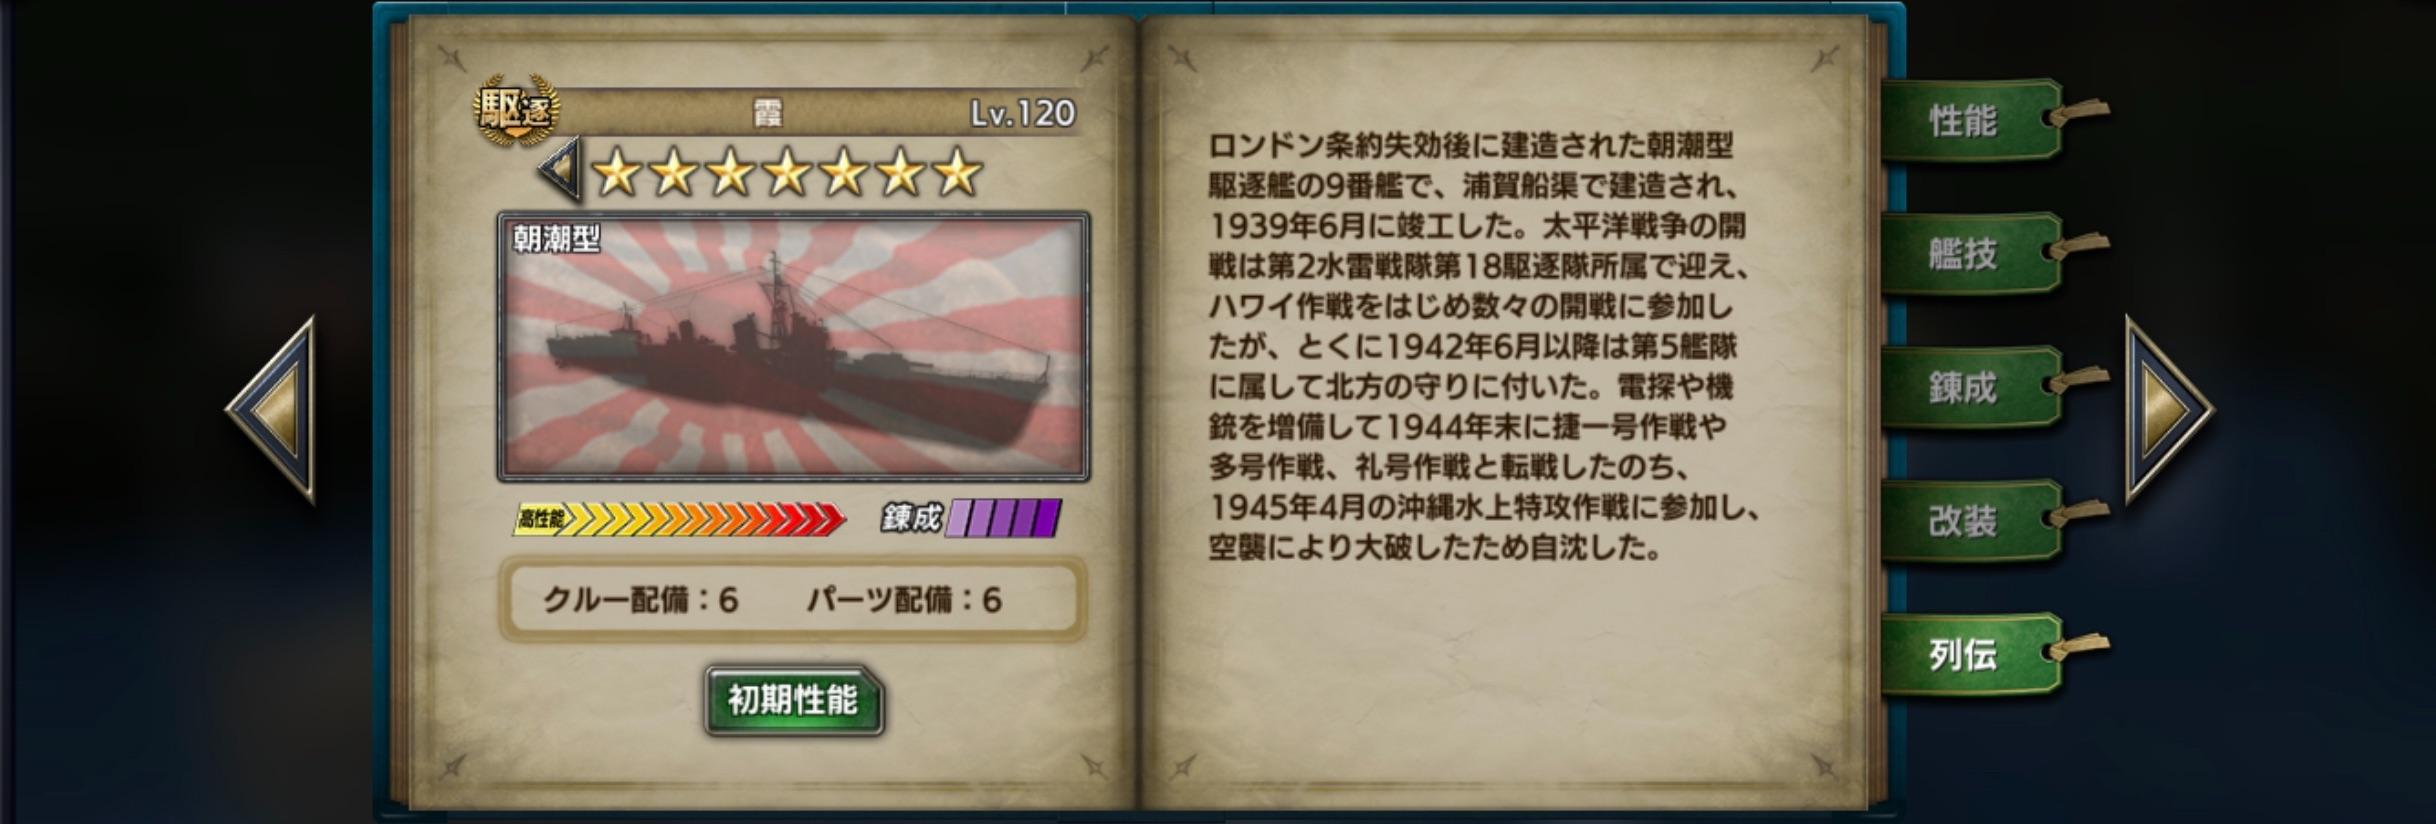 Kasumi-history